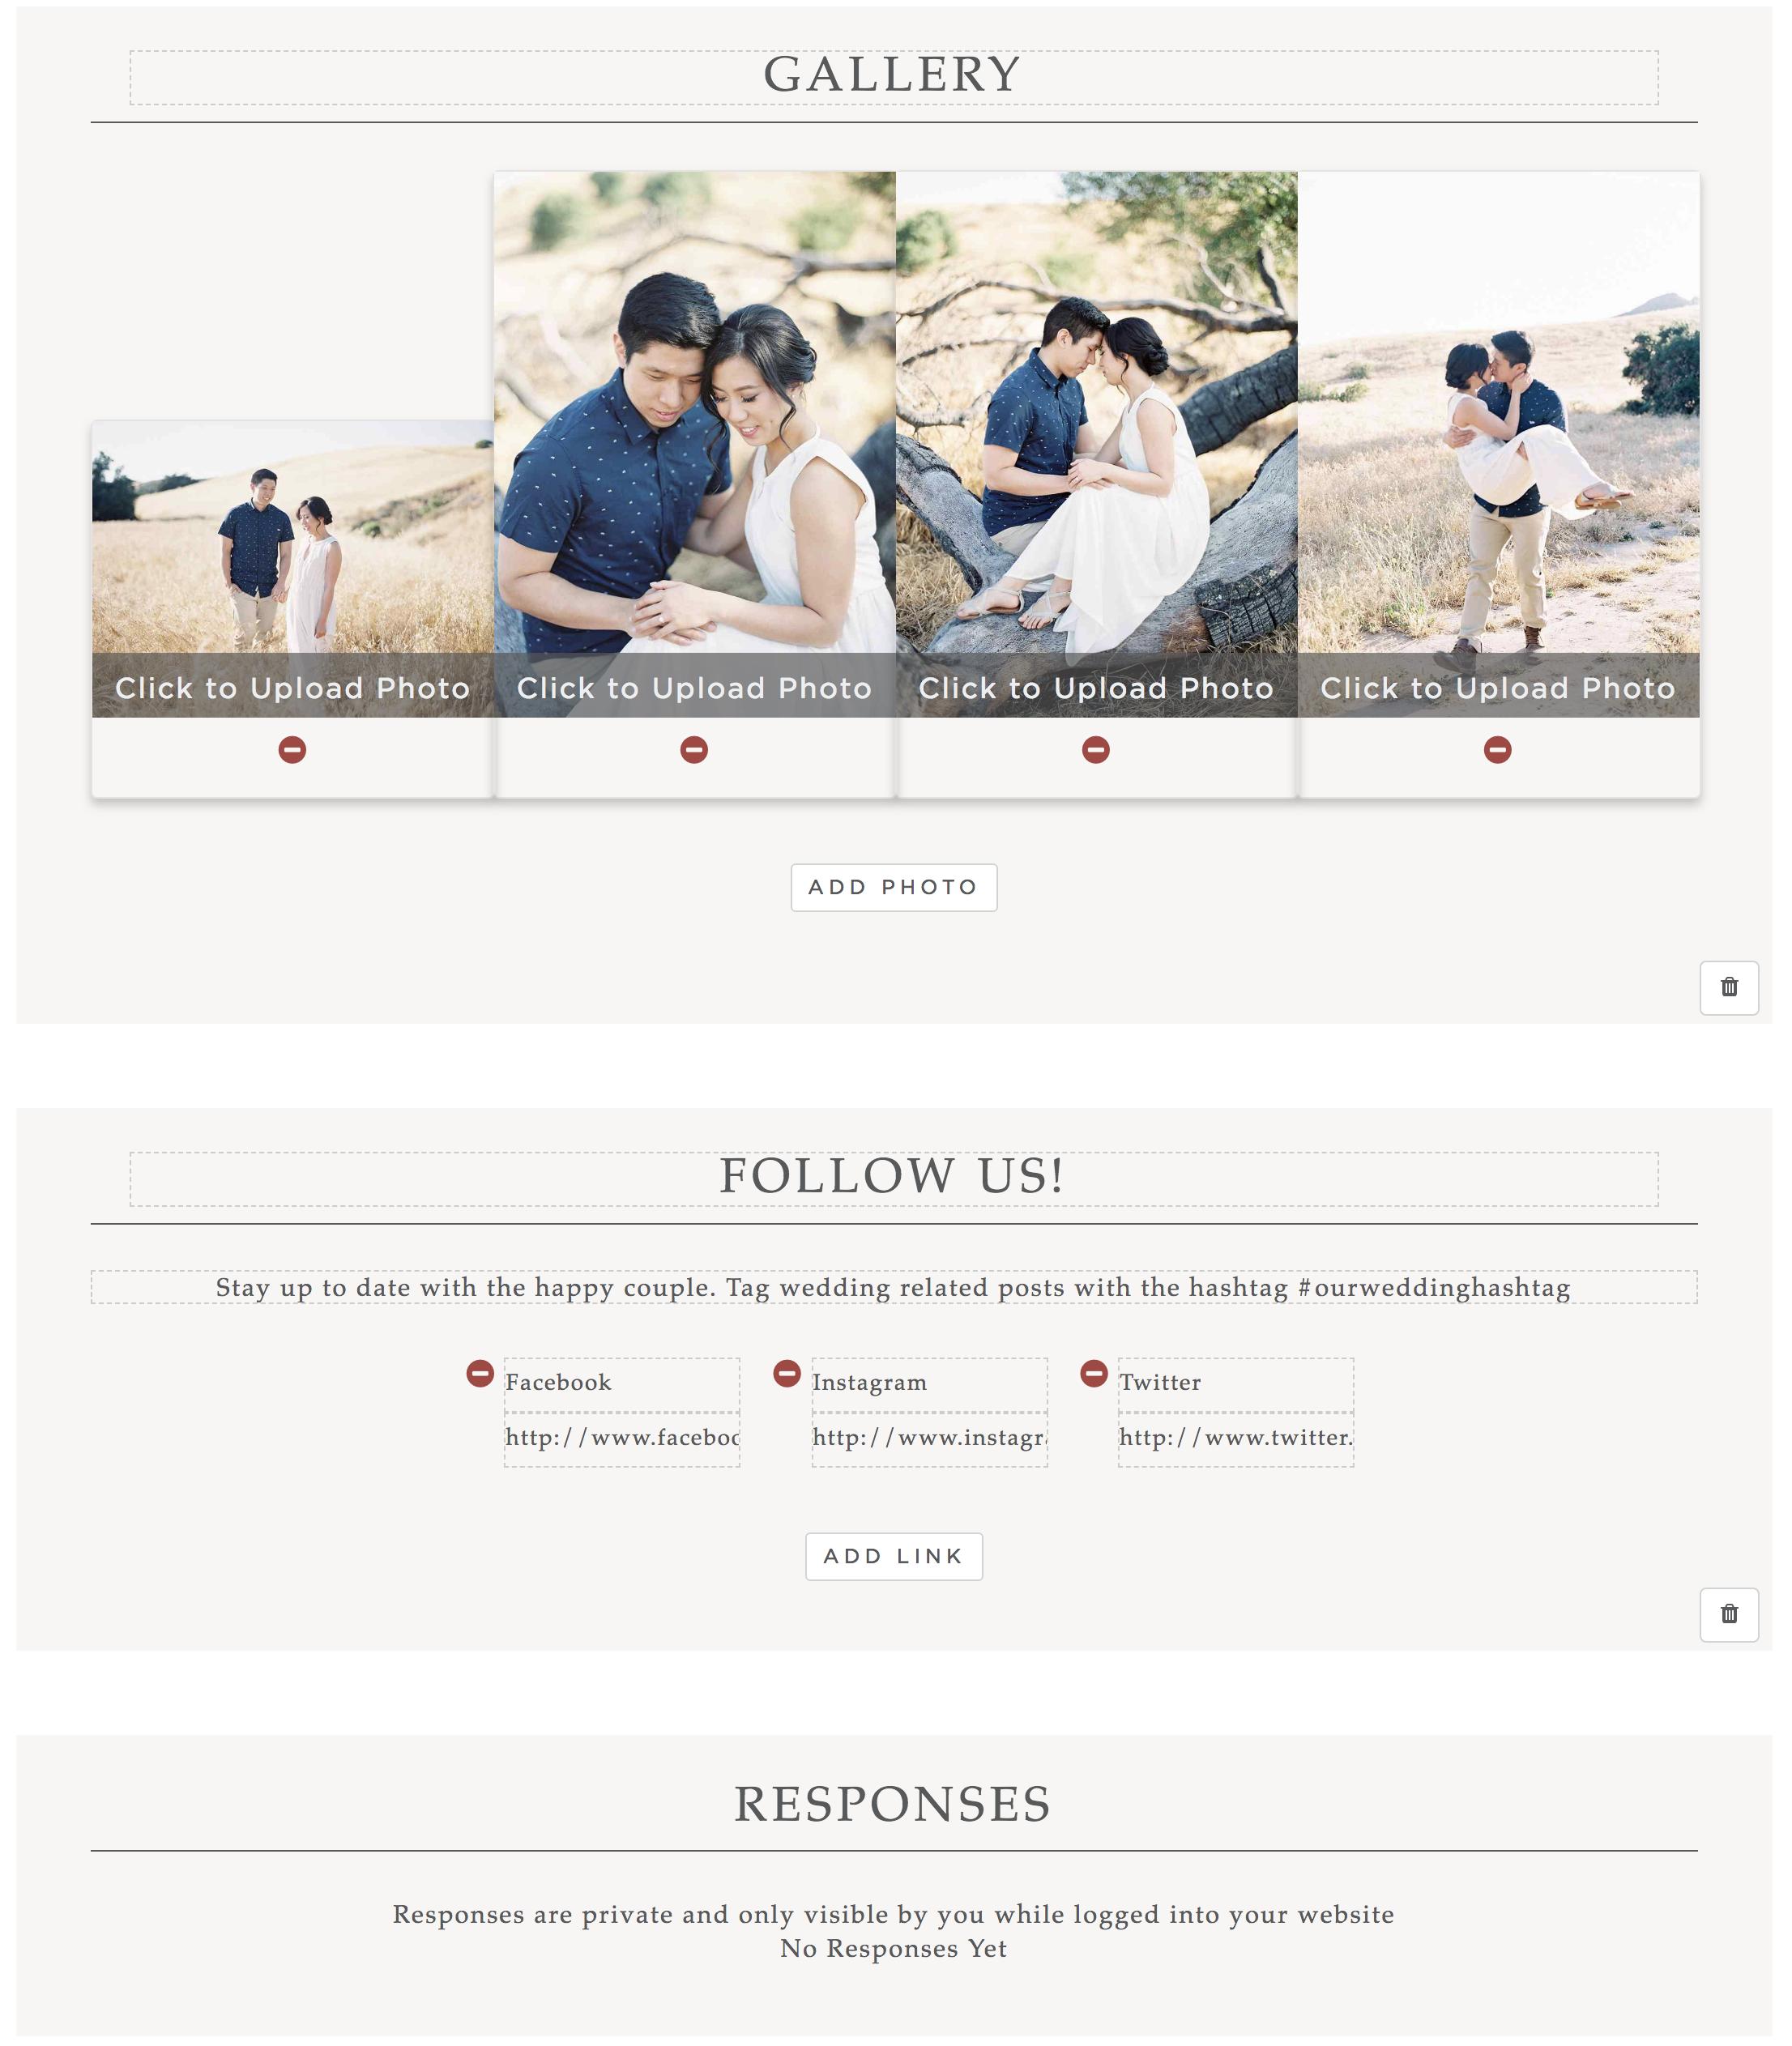 basic invite wedding website sample 7.png